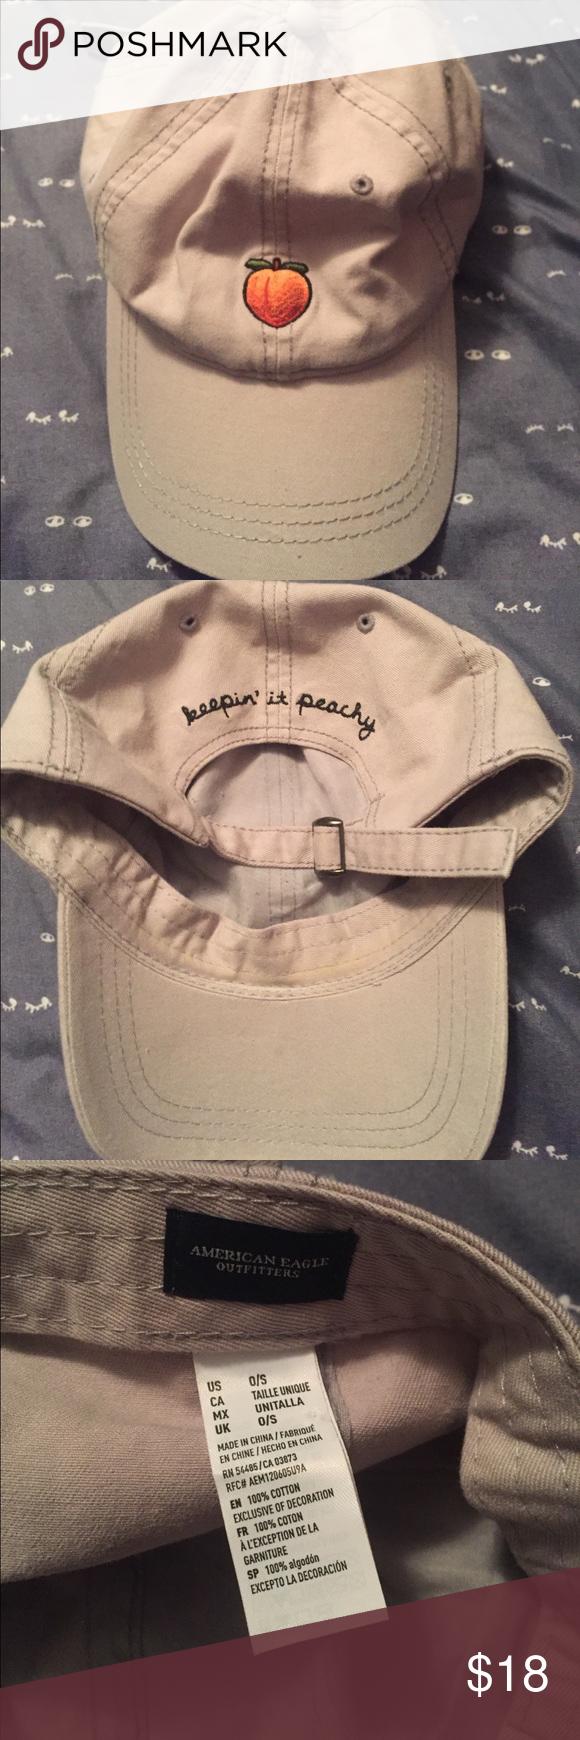 AEO  keeping it peachy  peach emoji hat 🍑 AEO  keeping it peachy  peach  emoji hat 🍑 only worn once! Super cute!! American Eagle Outfitters  Accessories ... 91f41a892b7c